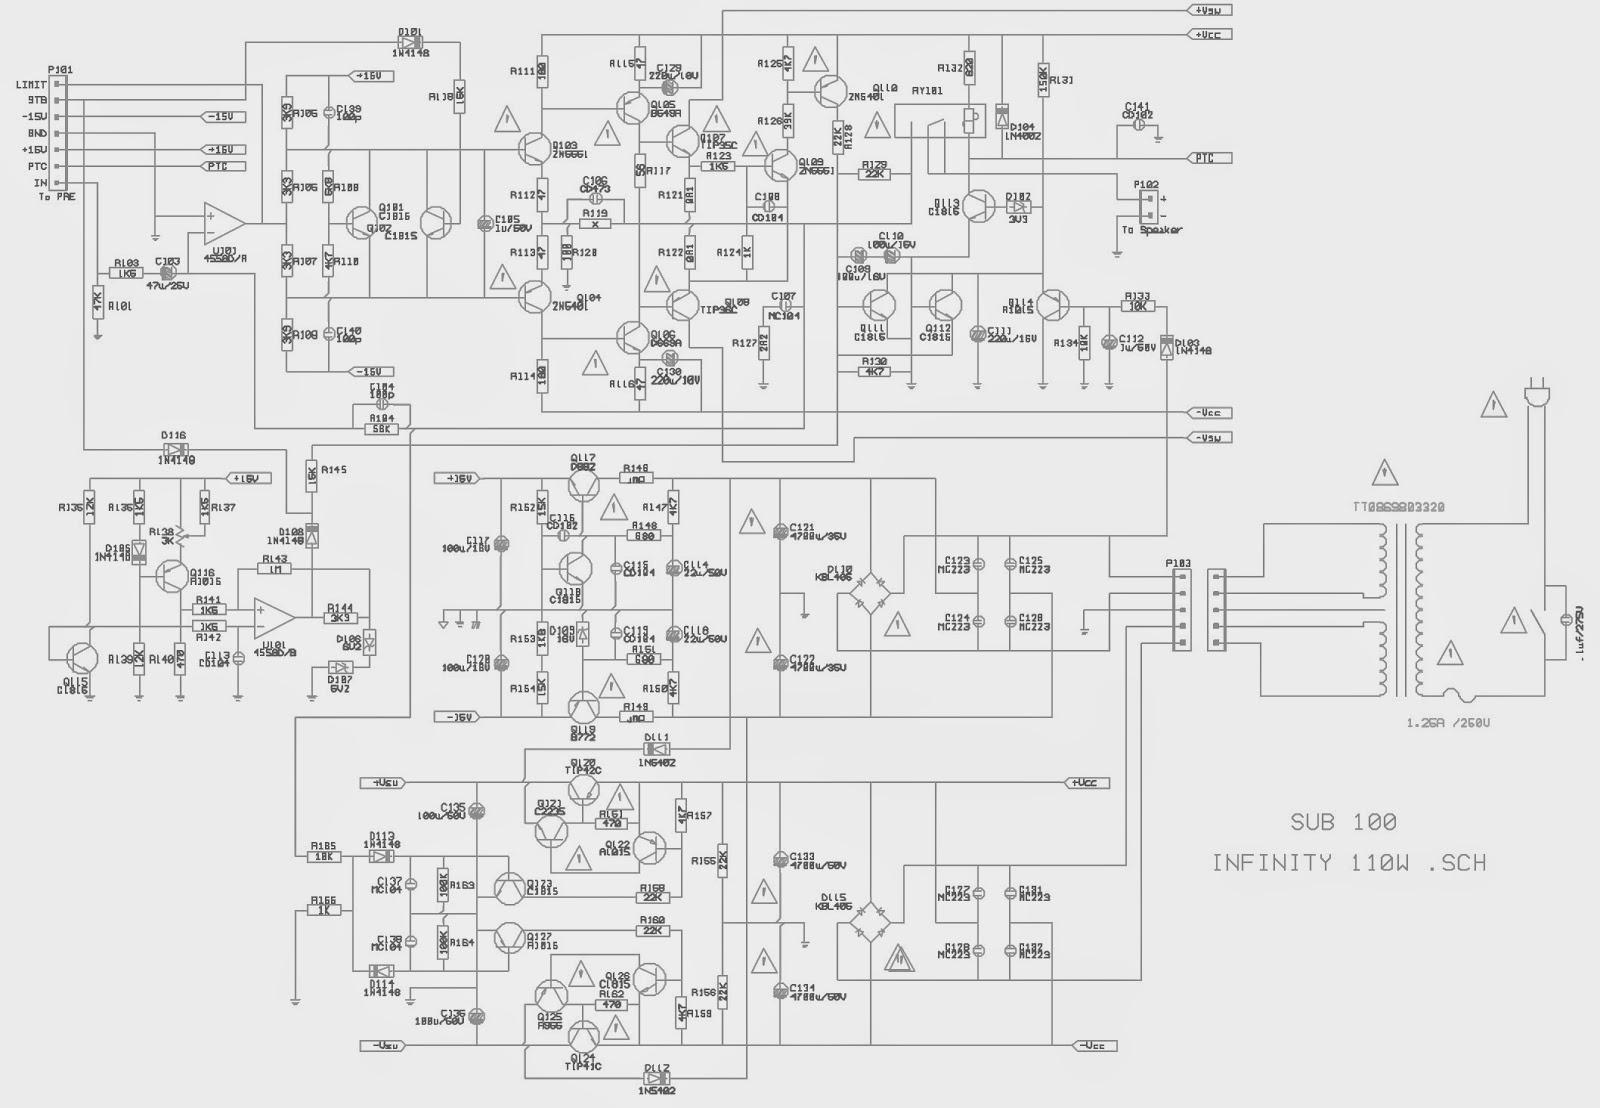 Electro Help Infinity Modulus Sub Amplifier Sub 100 Hts